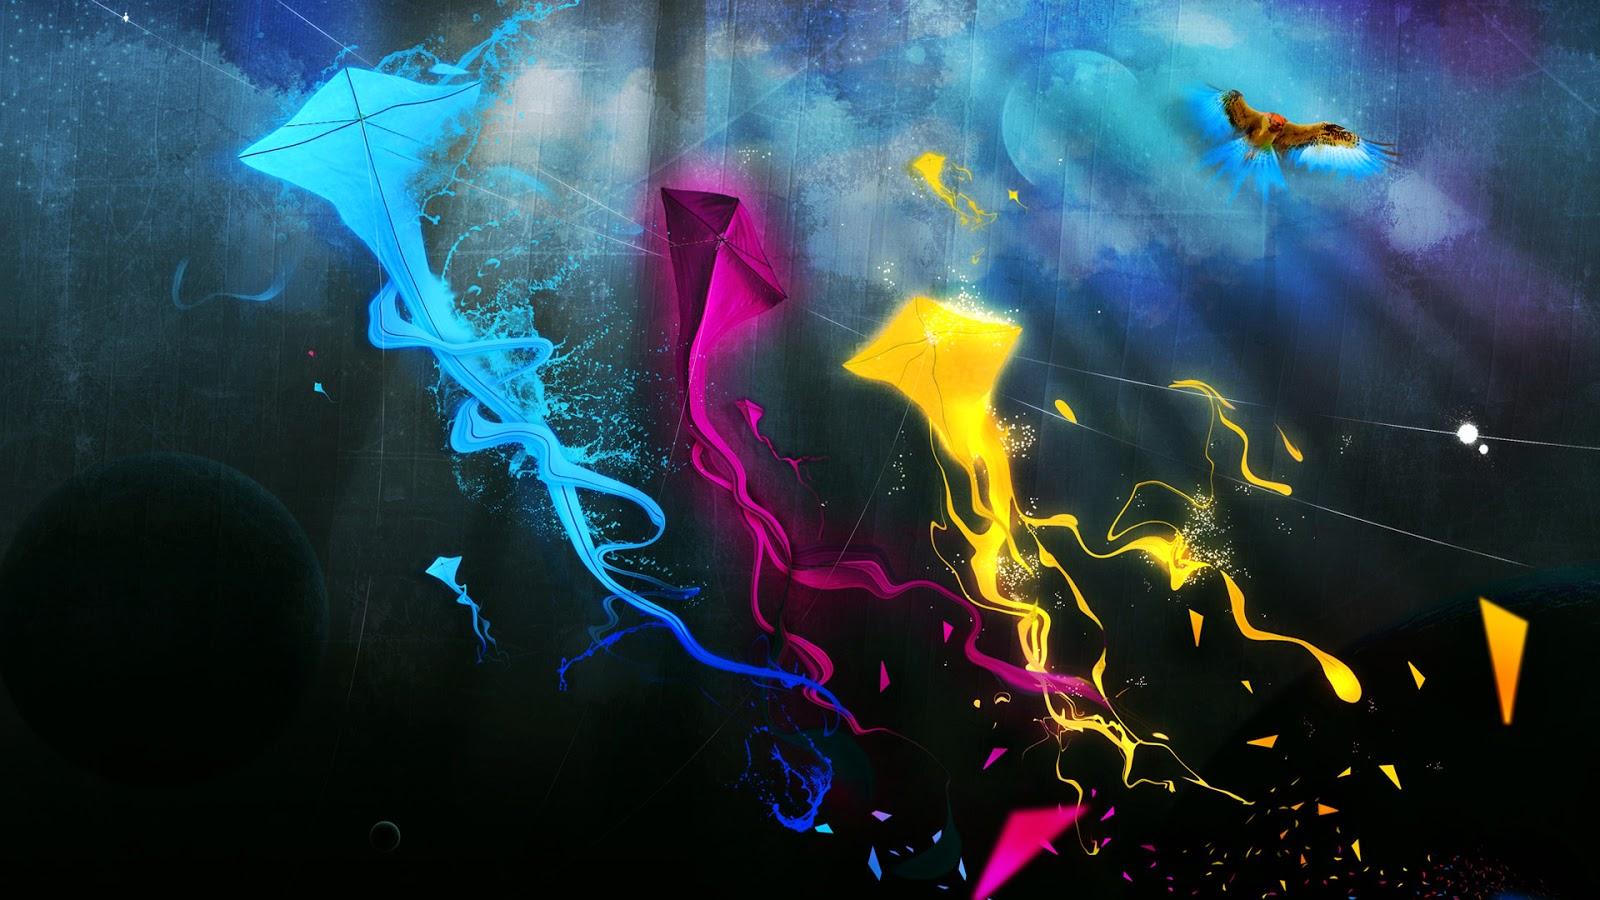 desktop graphic hd wallpapers - photo #27